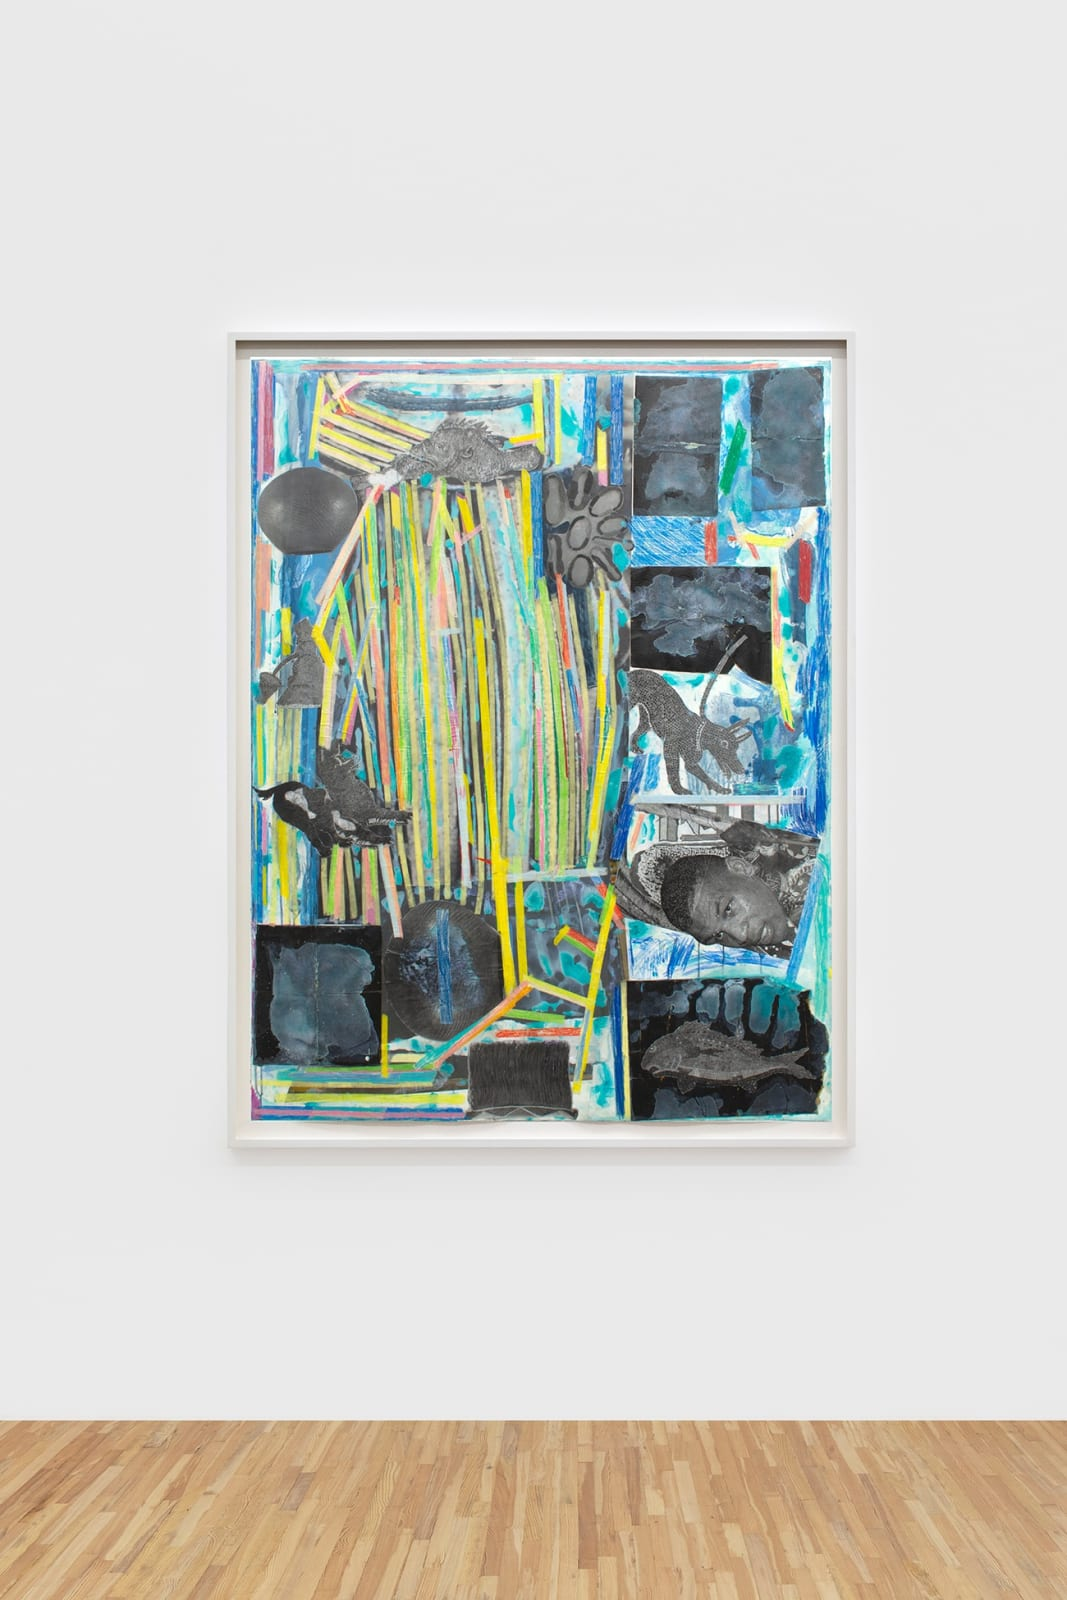 Moshekwa Langa Proximities, 2017 Mixed media on paper framed: 68 1/2 x 52 3/8 x 2 in (174 x 133 x 5.1 cm)